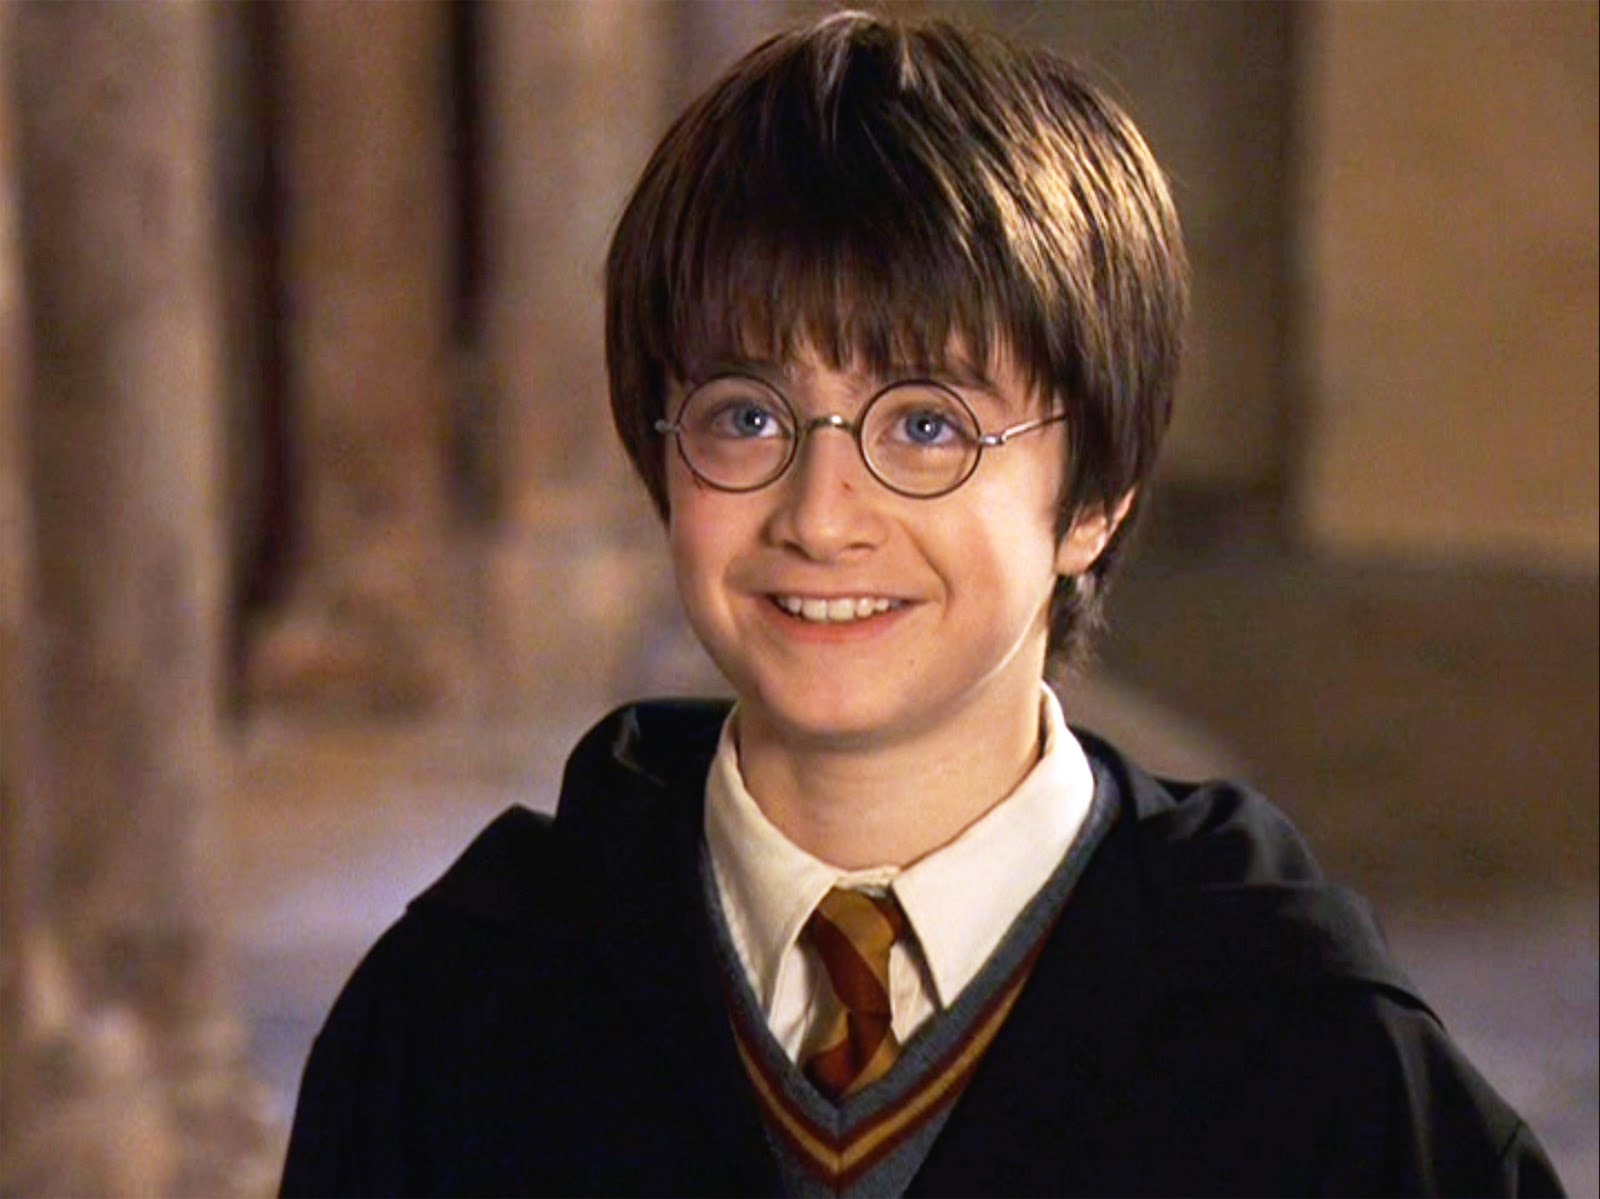 Harry Potter ubriaco Radcliffe